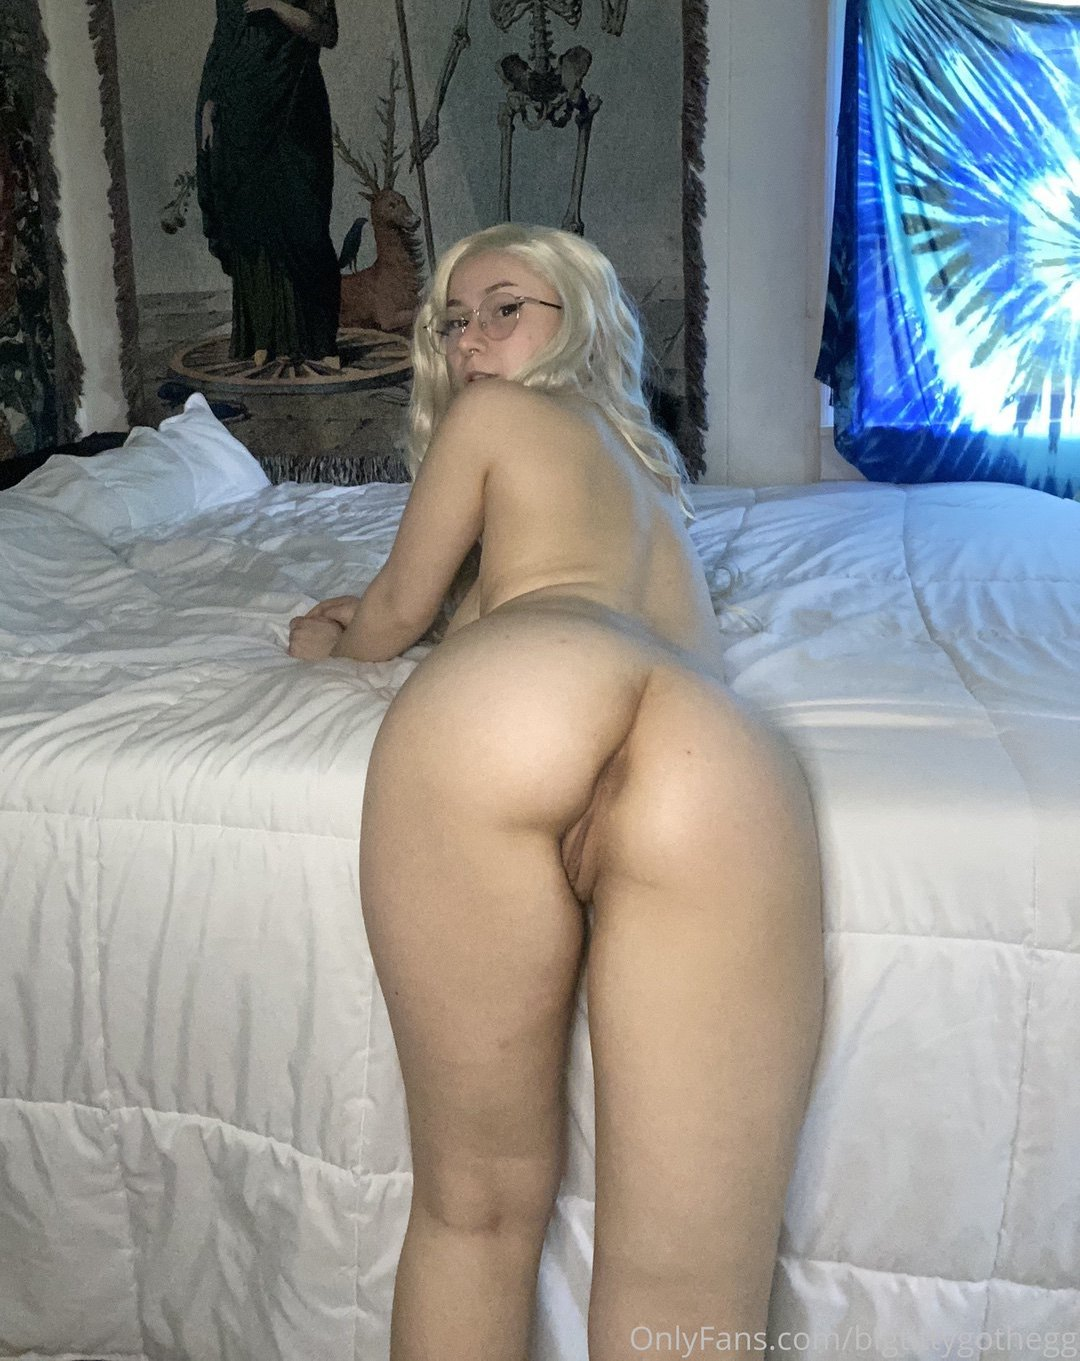 Lee Bigtittygothegg Onlyfans Nudes Leaks 0014